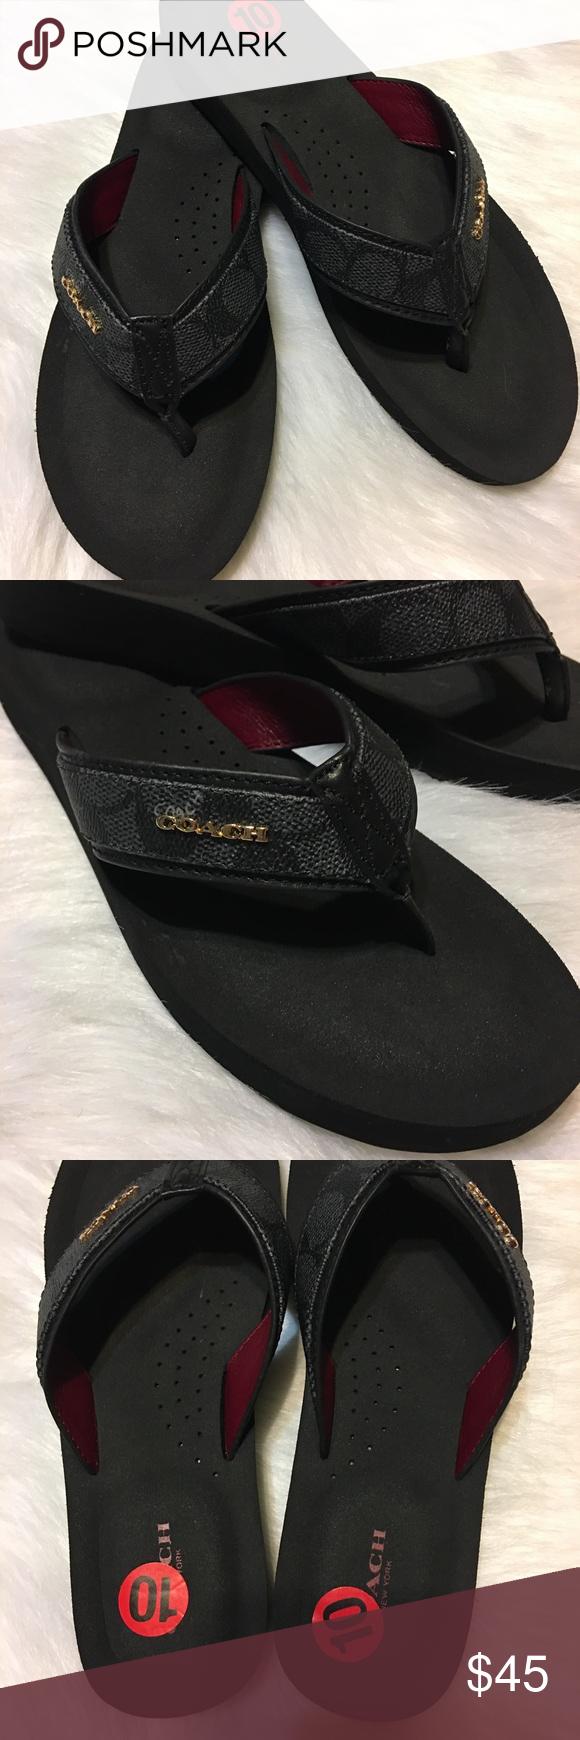 4f35cbb0b8b0 Coach Judy Flip Flop in Black Denim Black Coach Judy Flip Flop in  Black Denim Black. Size 10. NWOT. Never worn. Amazingly comfortable flip  flop in black.